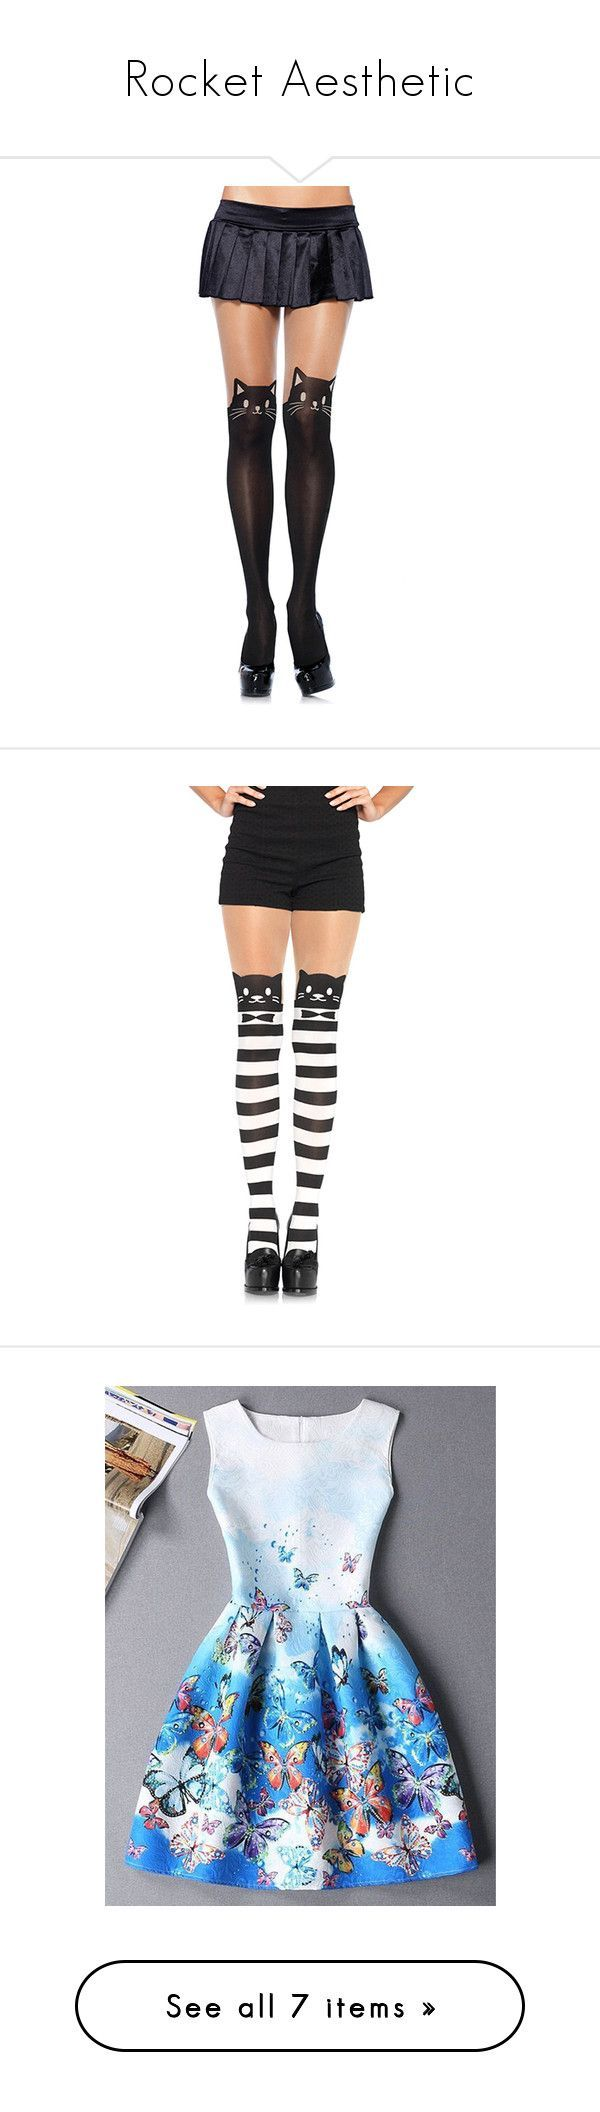 """Rocket Aesthetic"" by asriel20asi ❤ liked on Polyvore featuring intimates, hosiery, tights, black, socks & hosiery, leg avenue stockings, leg avenue pantyhose, animal print tights, leg avenue tights and leg avenue #Socks&Hosiery"